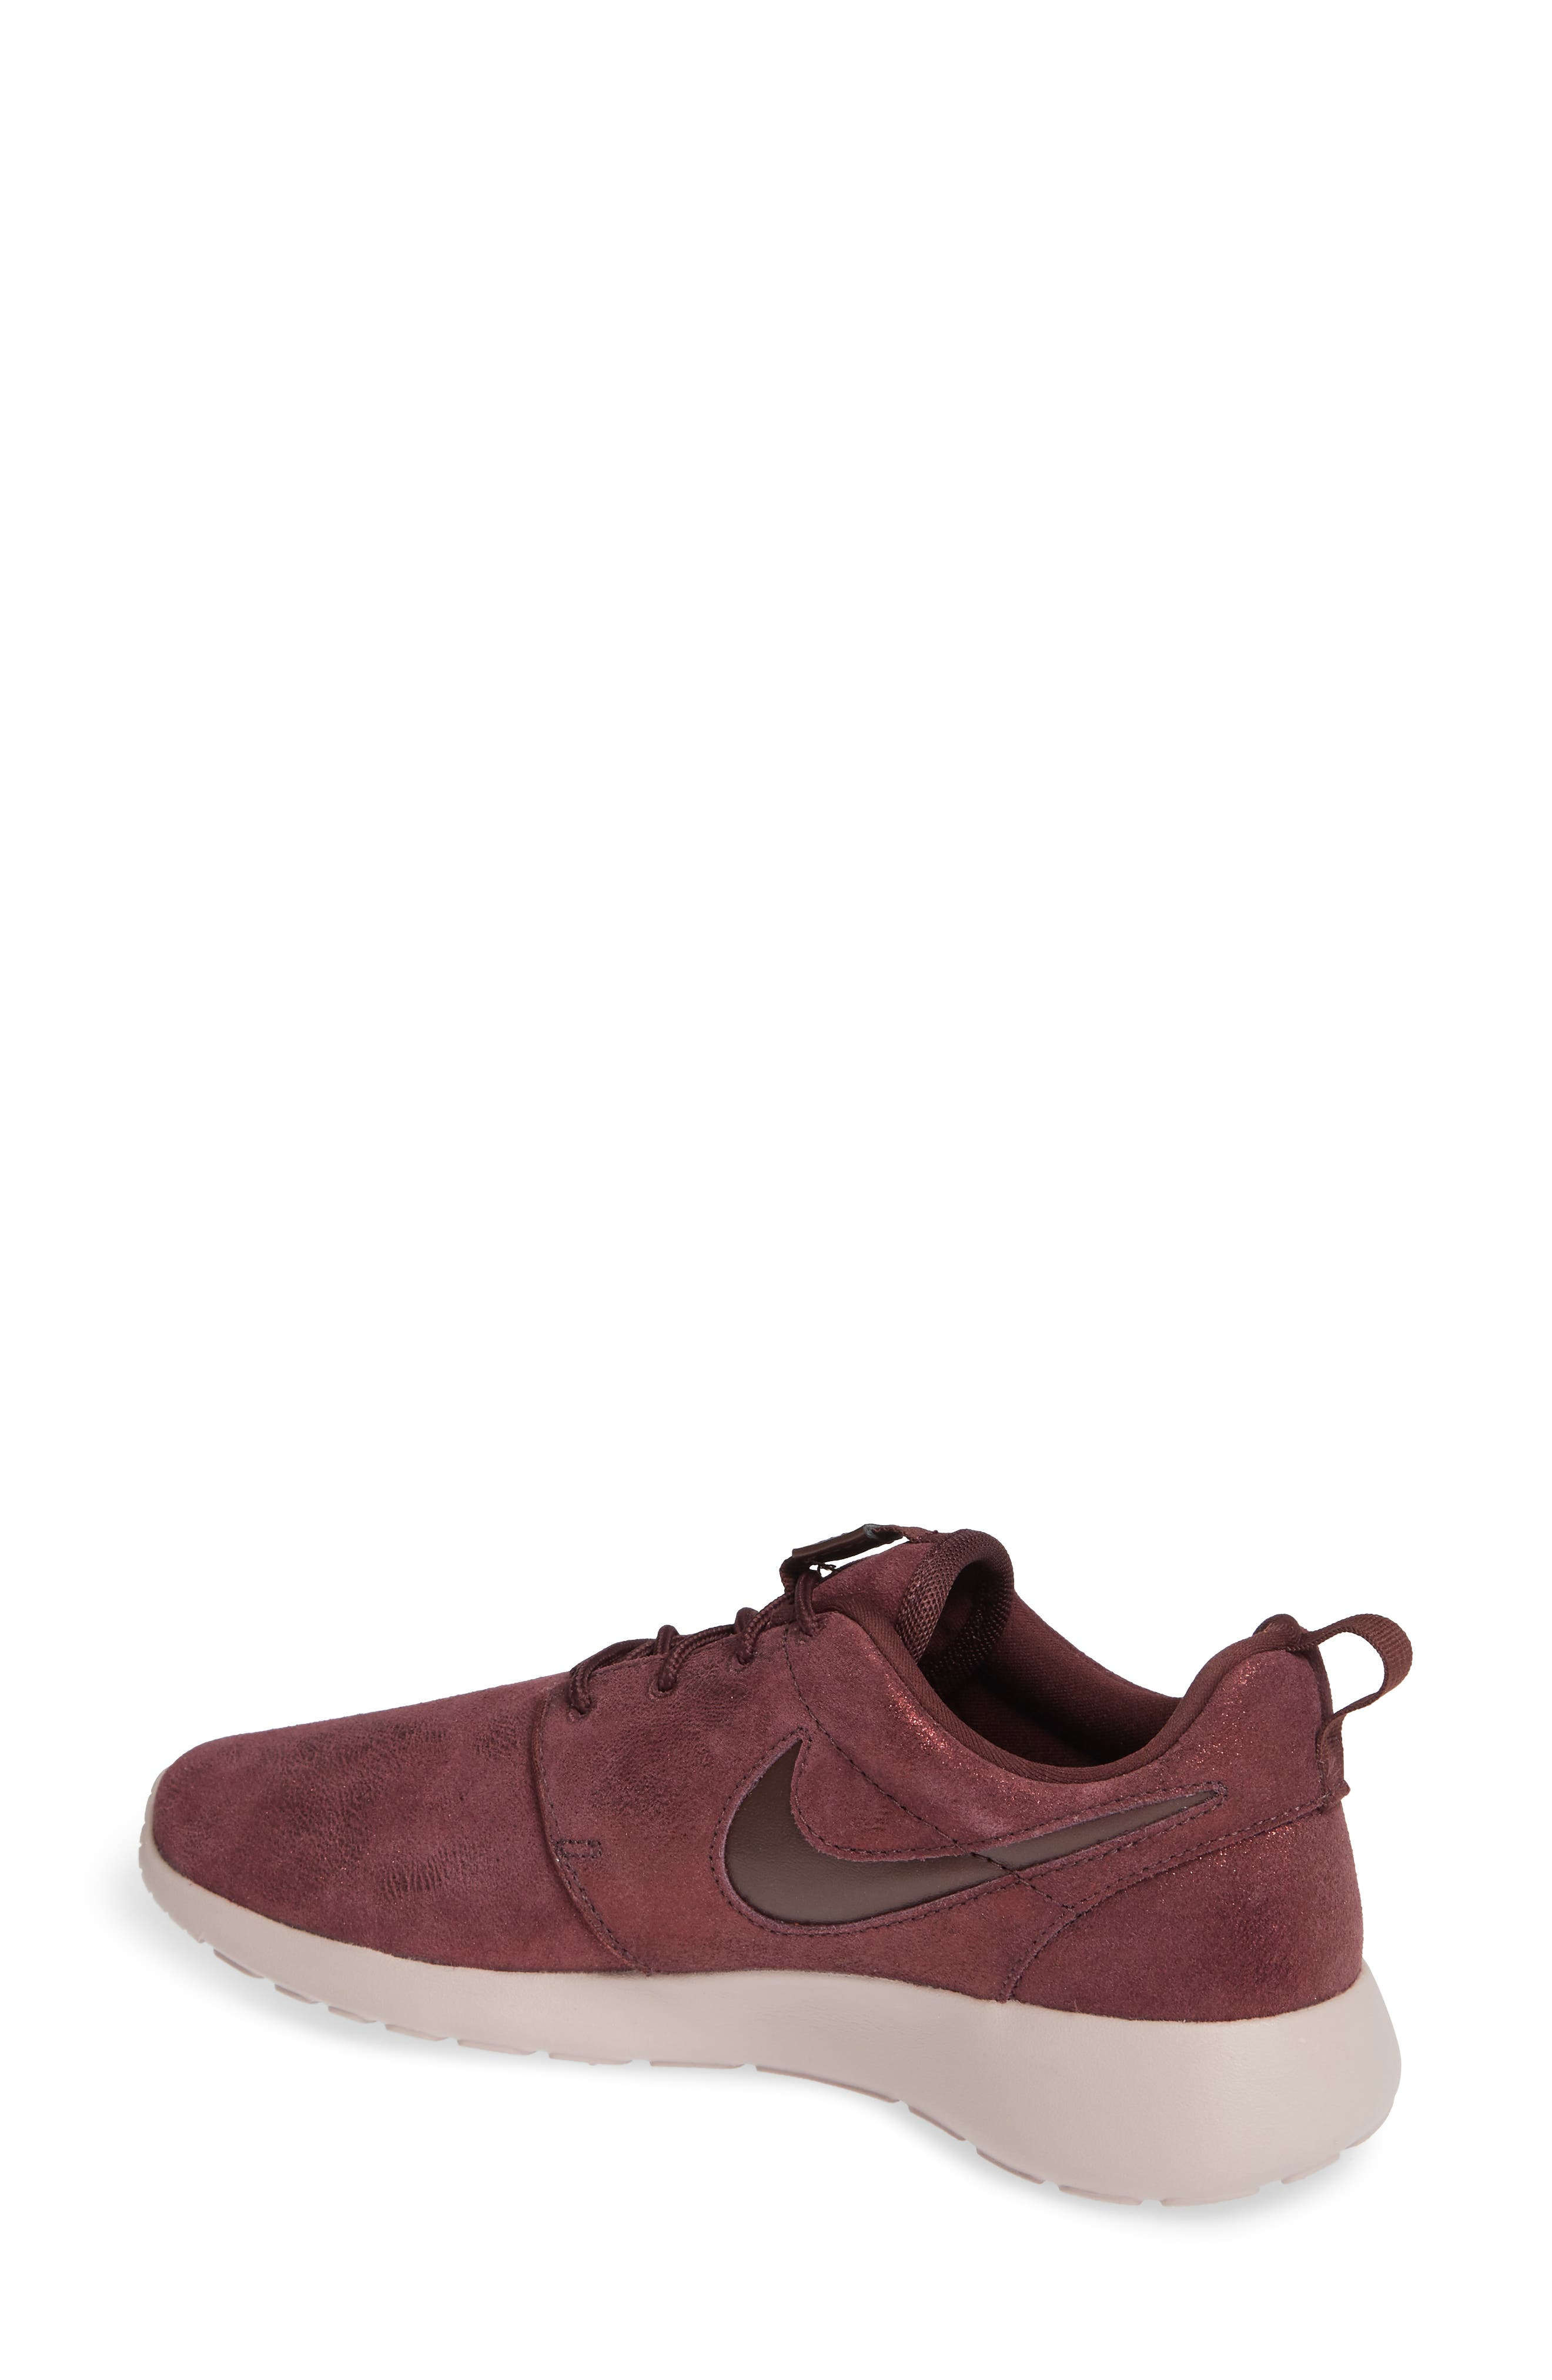 'Roshe Run' Print Sneaker,                             Alternate thumbnail 2, color,                             METALLIC MAHOGANY/ MAHOGANY